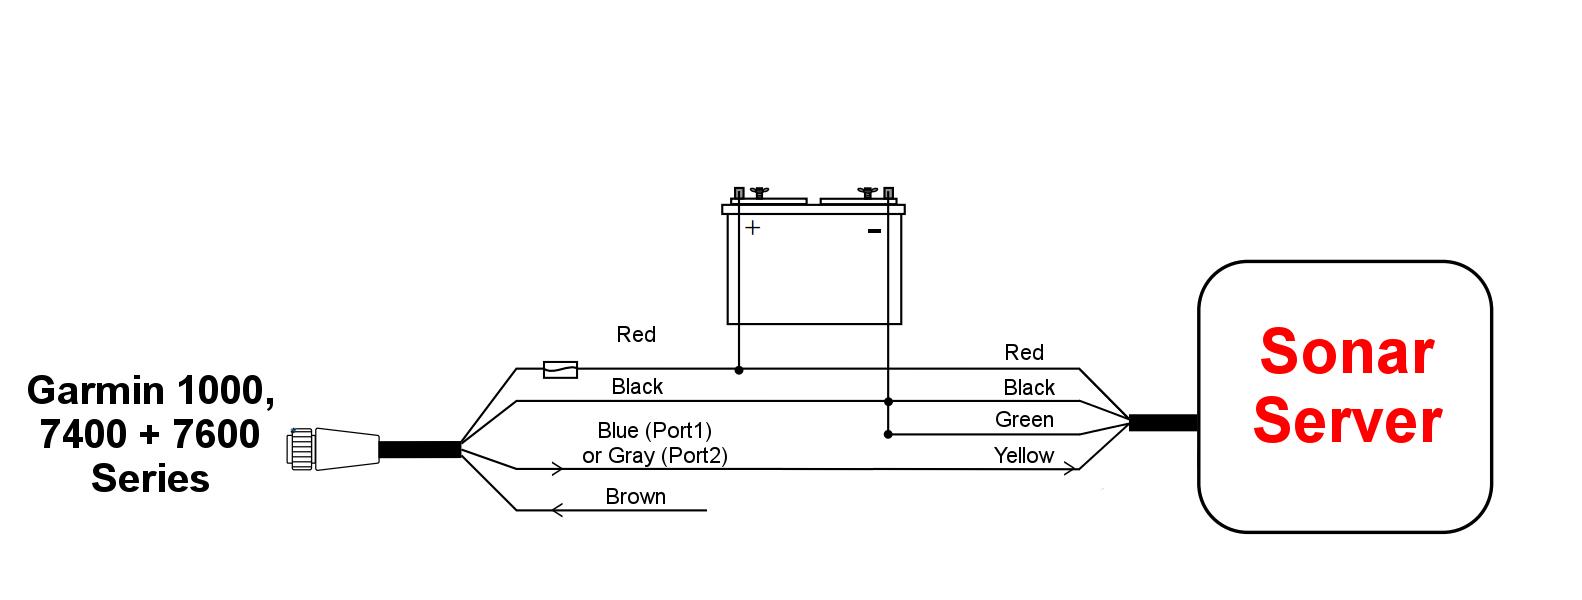 hight resolution of interfacing to garmin multi function displays sonar server american the wiring diagram